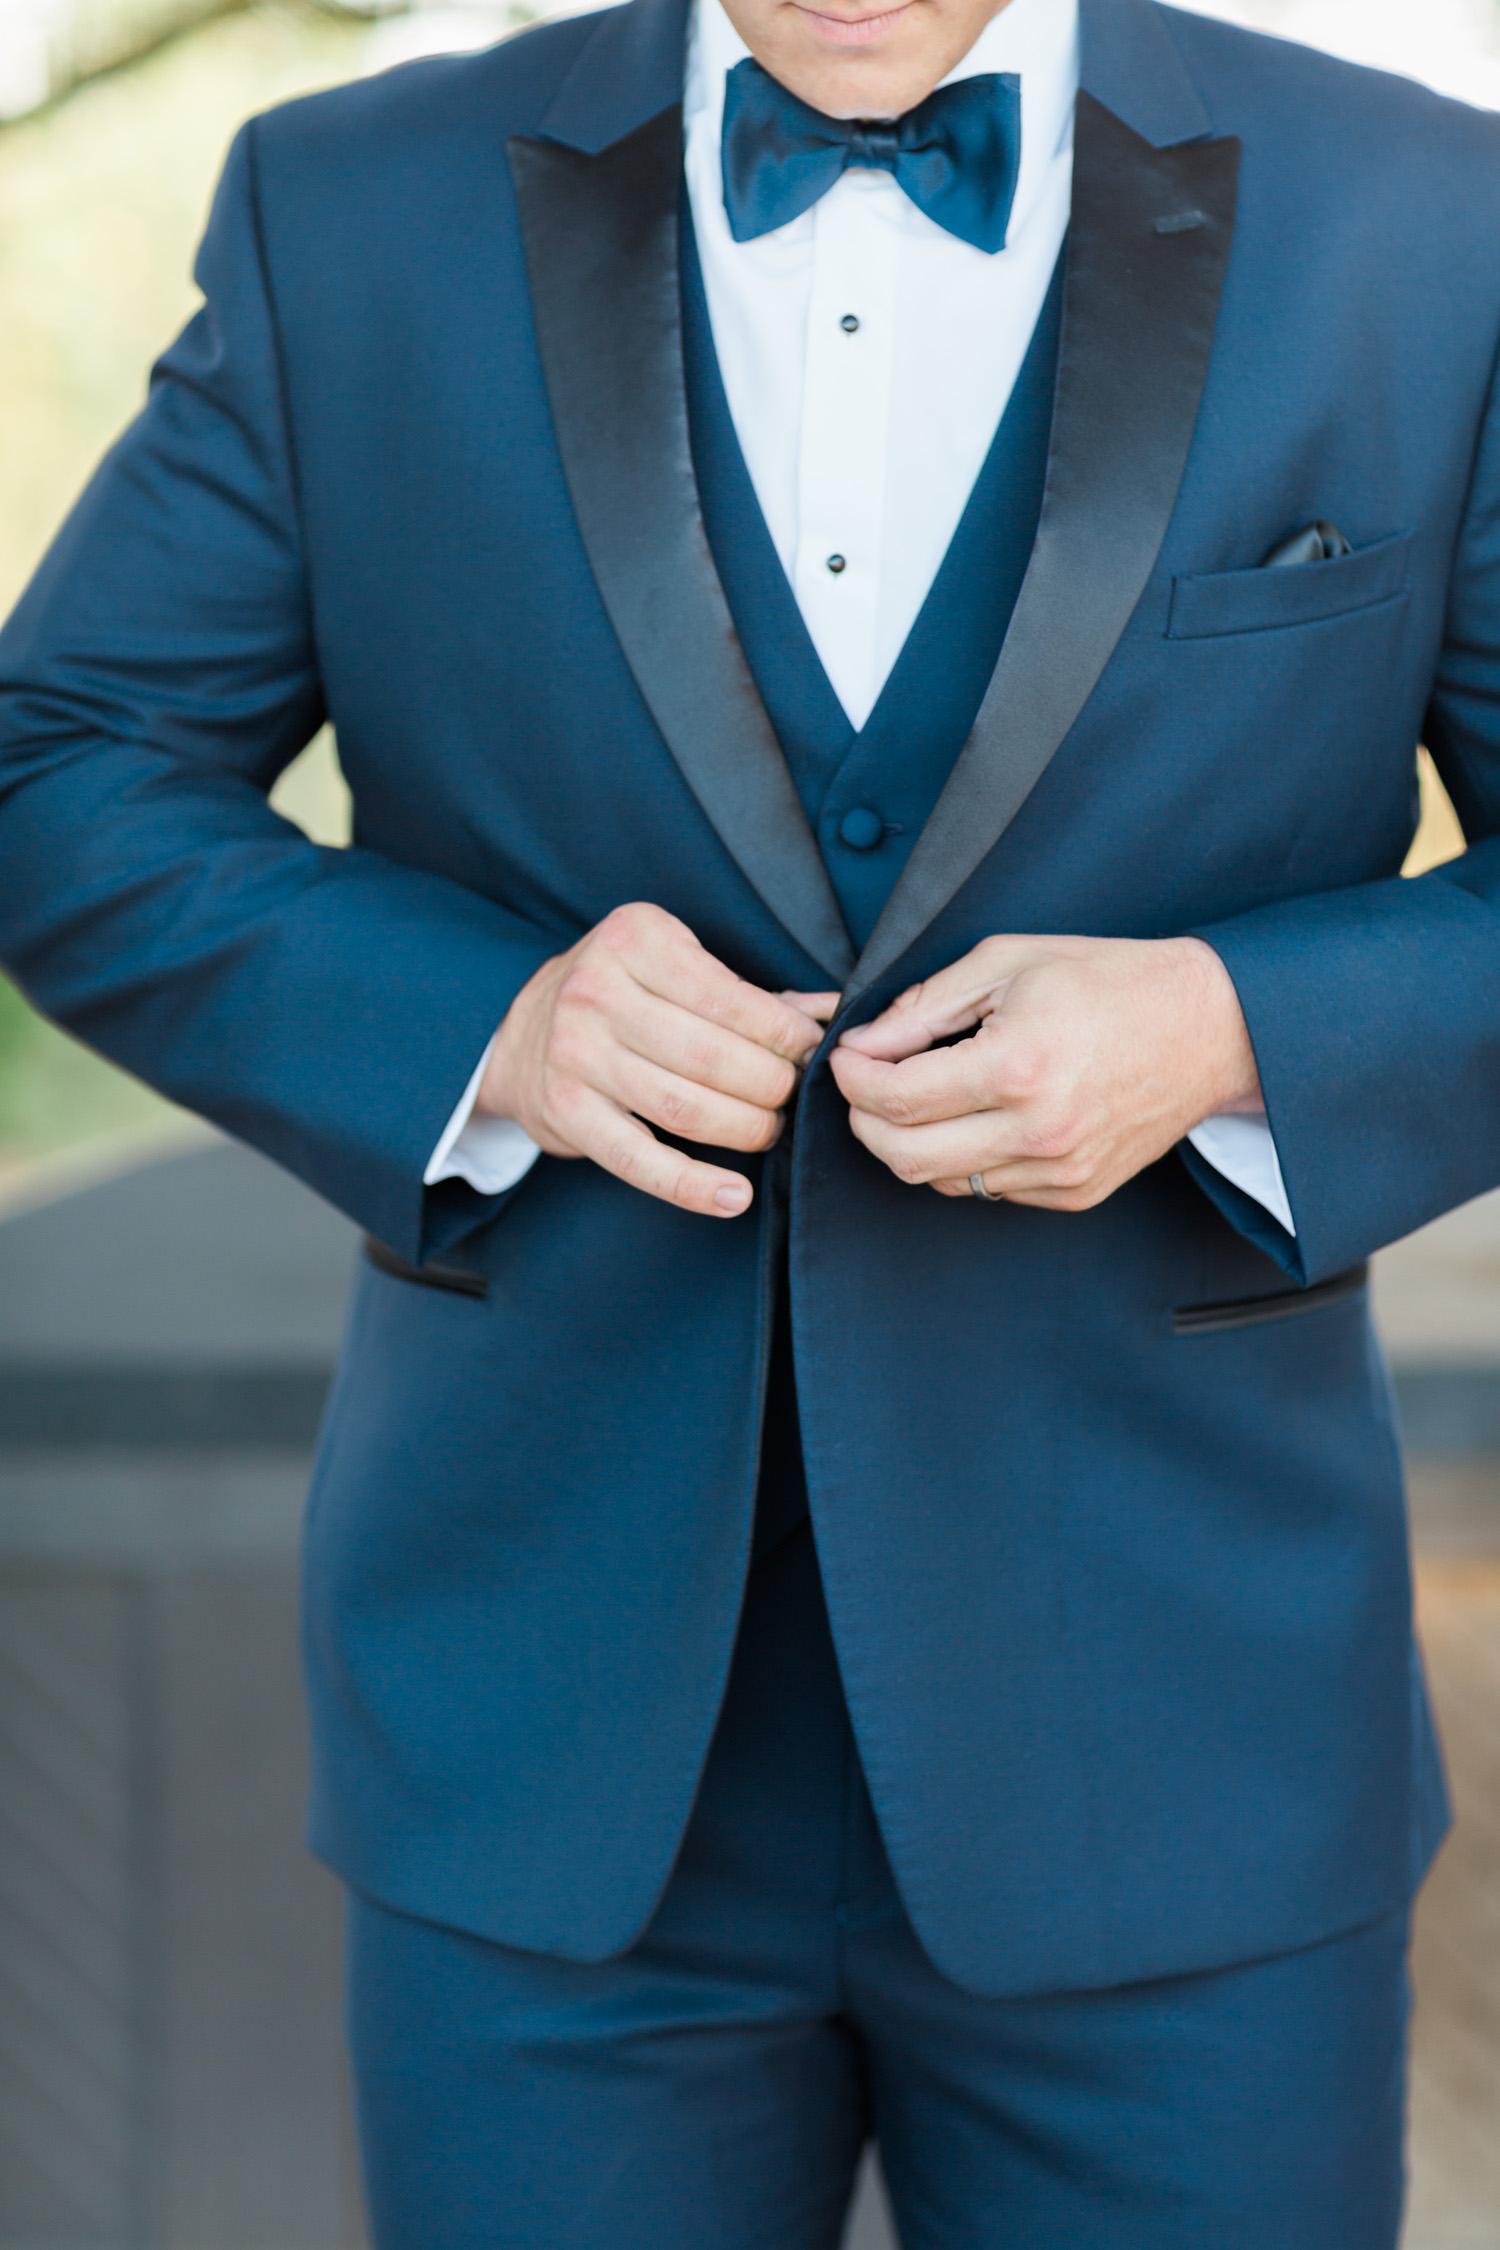 Groom in navy, buttoning hus tuxedo jacket